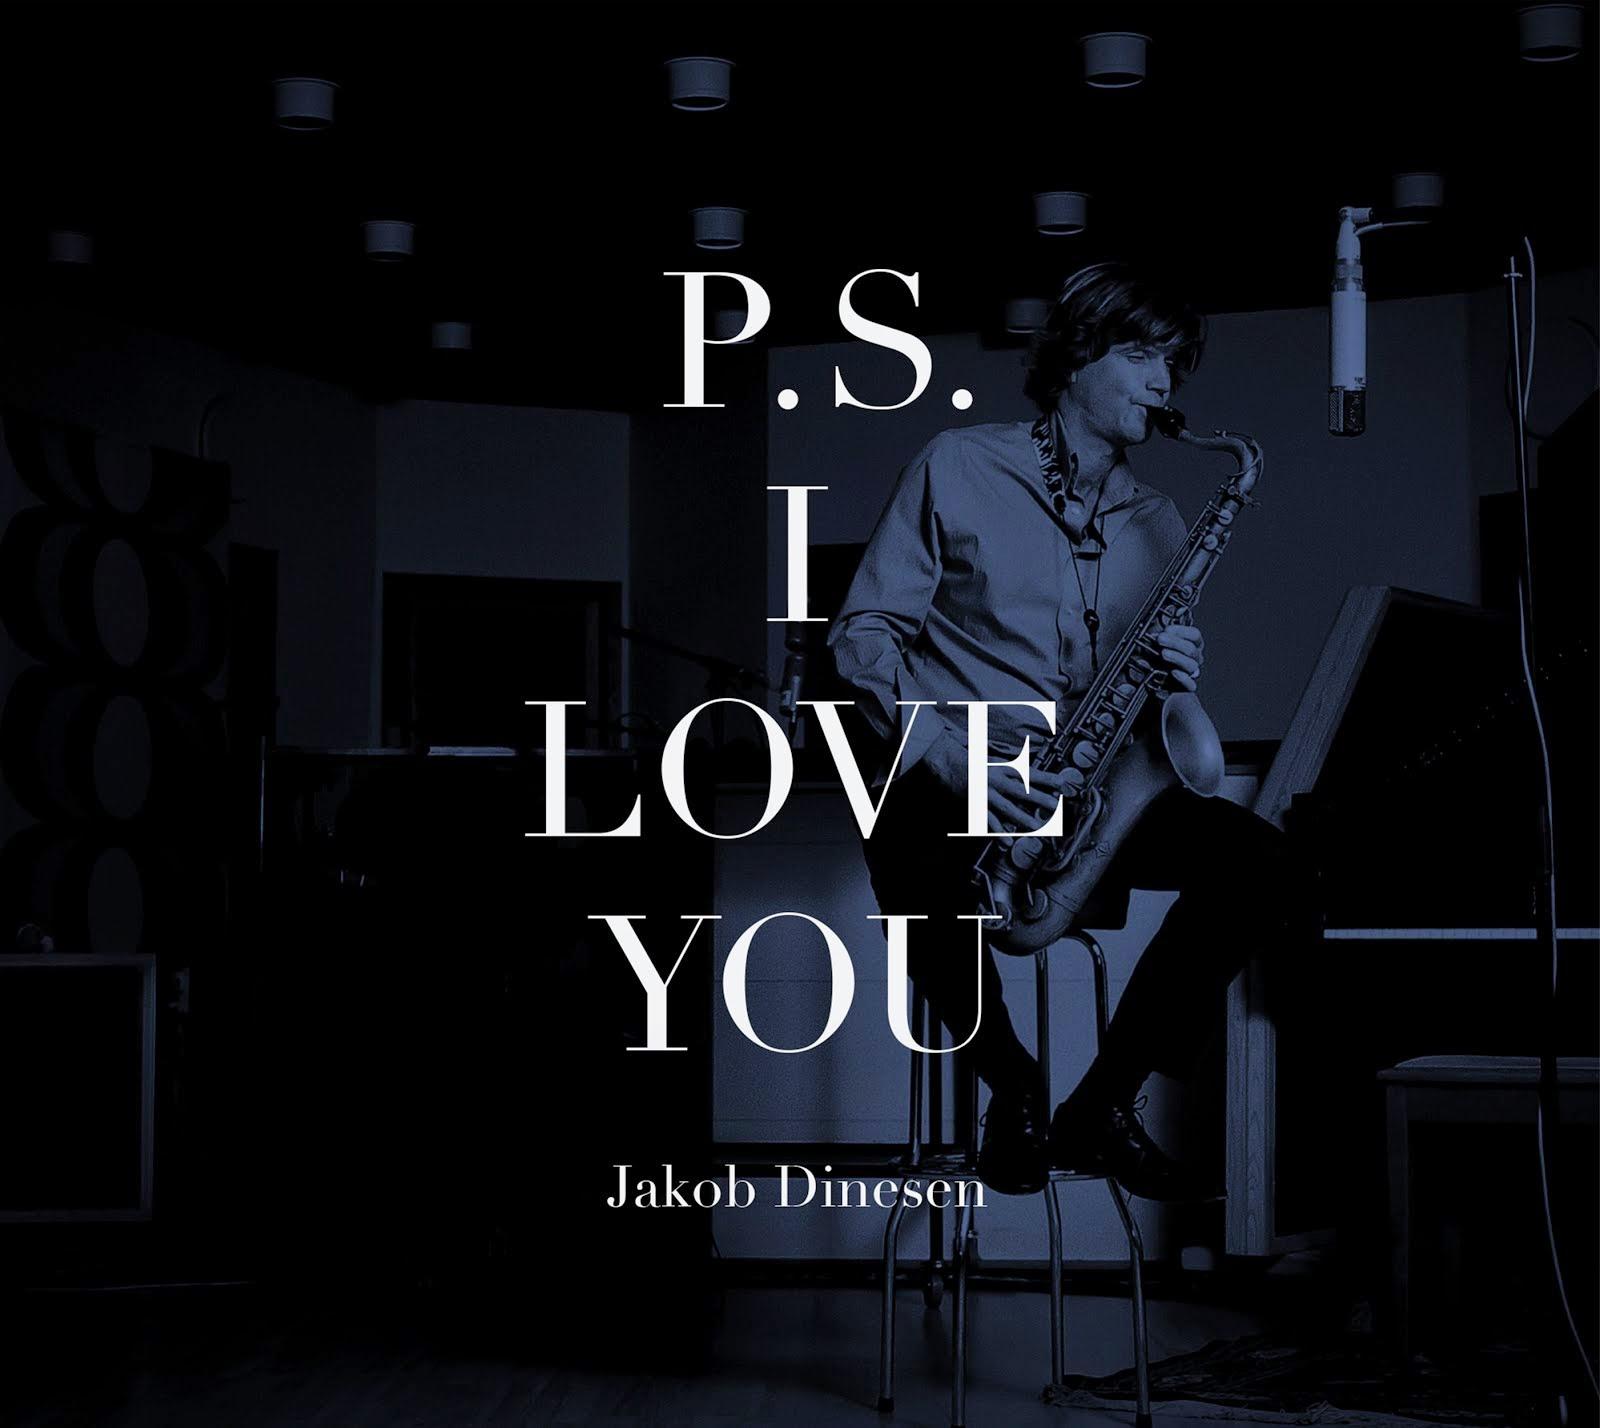 <br>ヤコブ・ディネセン『P.S. I Love You』